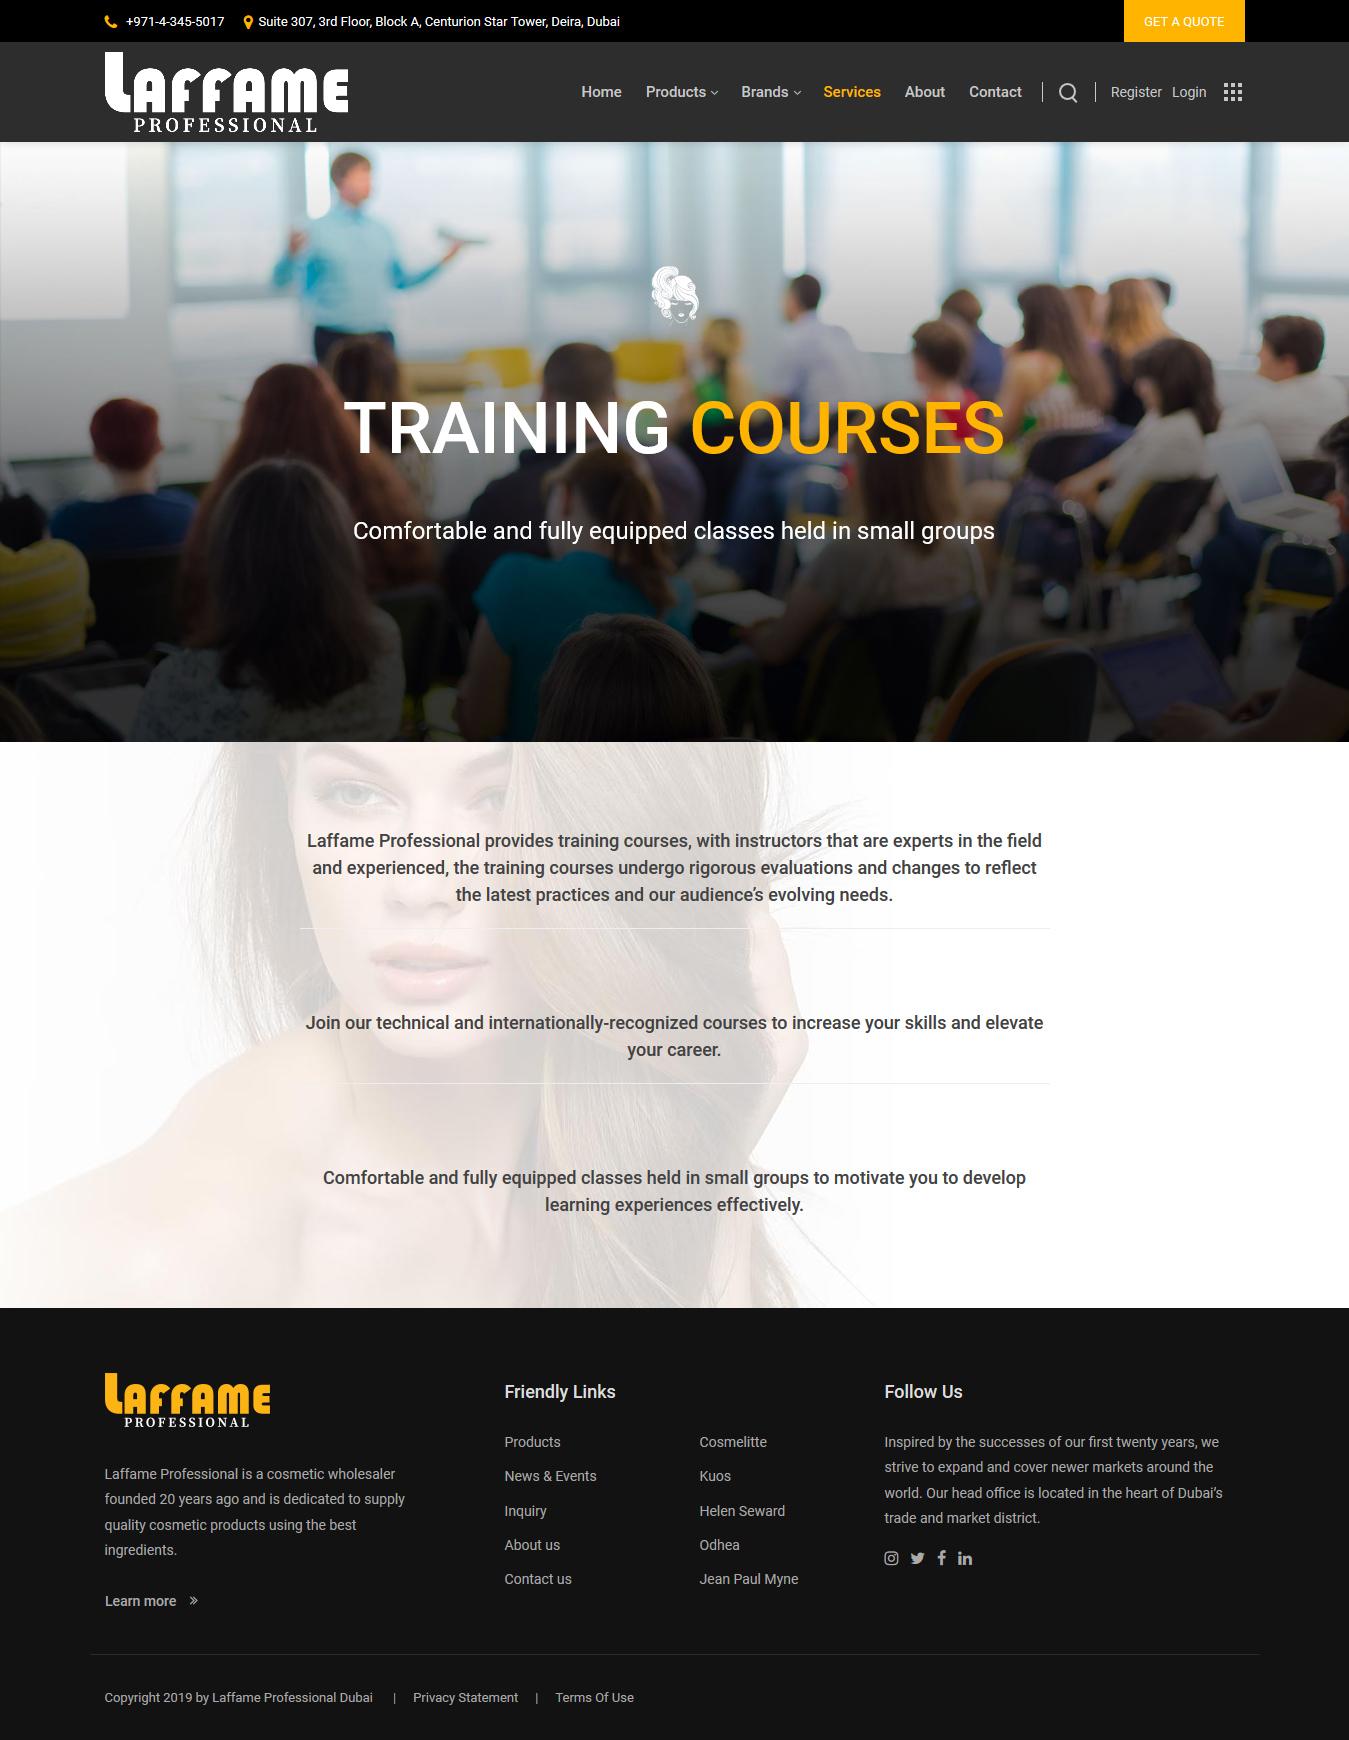 laffameprofessional-services